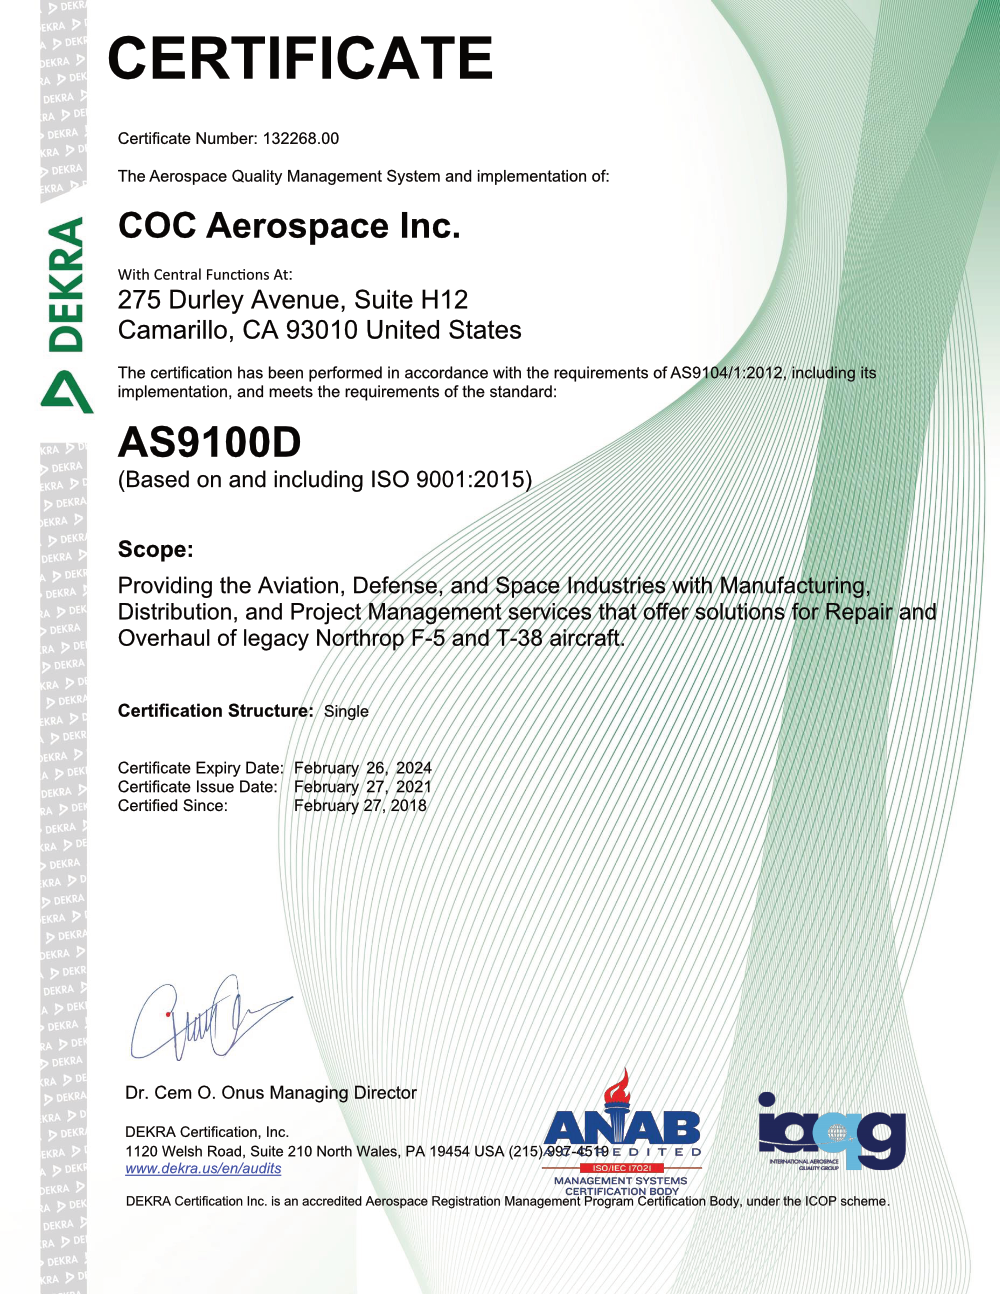 AS9100D Certification